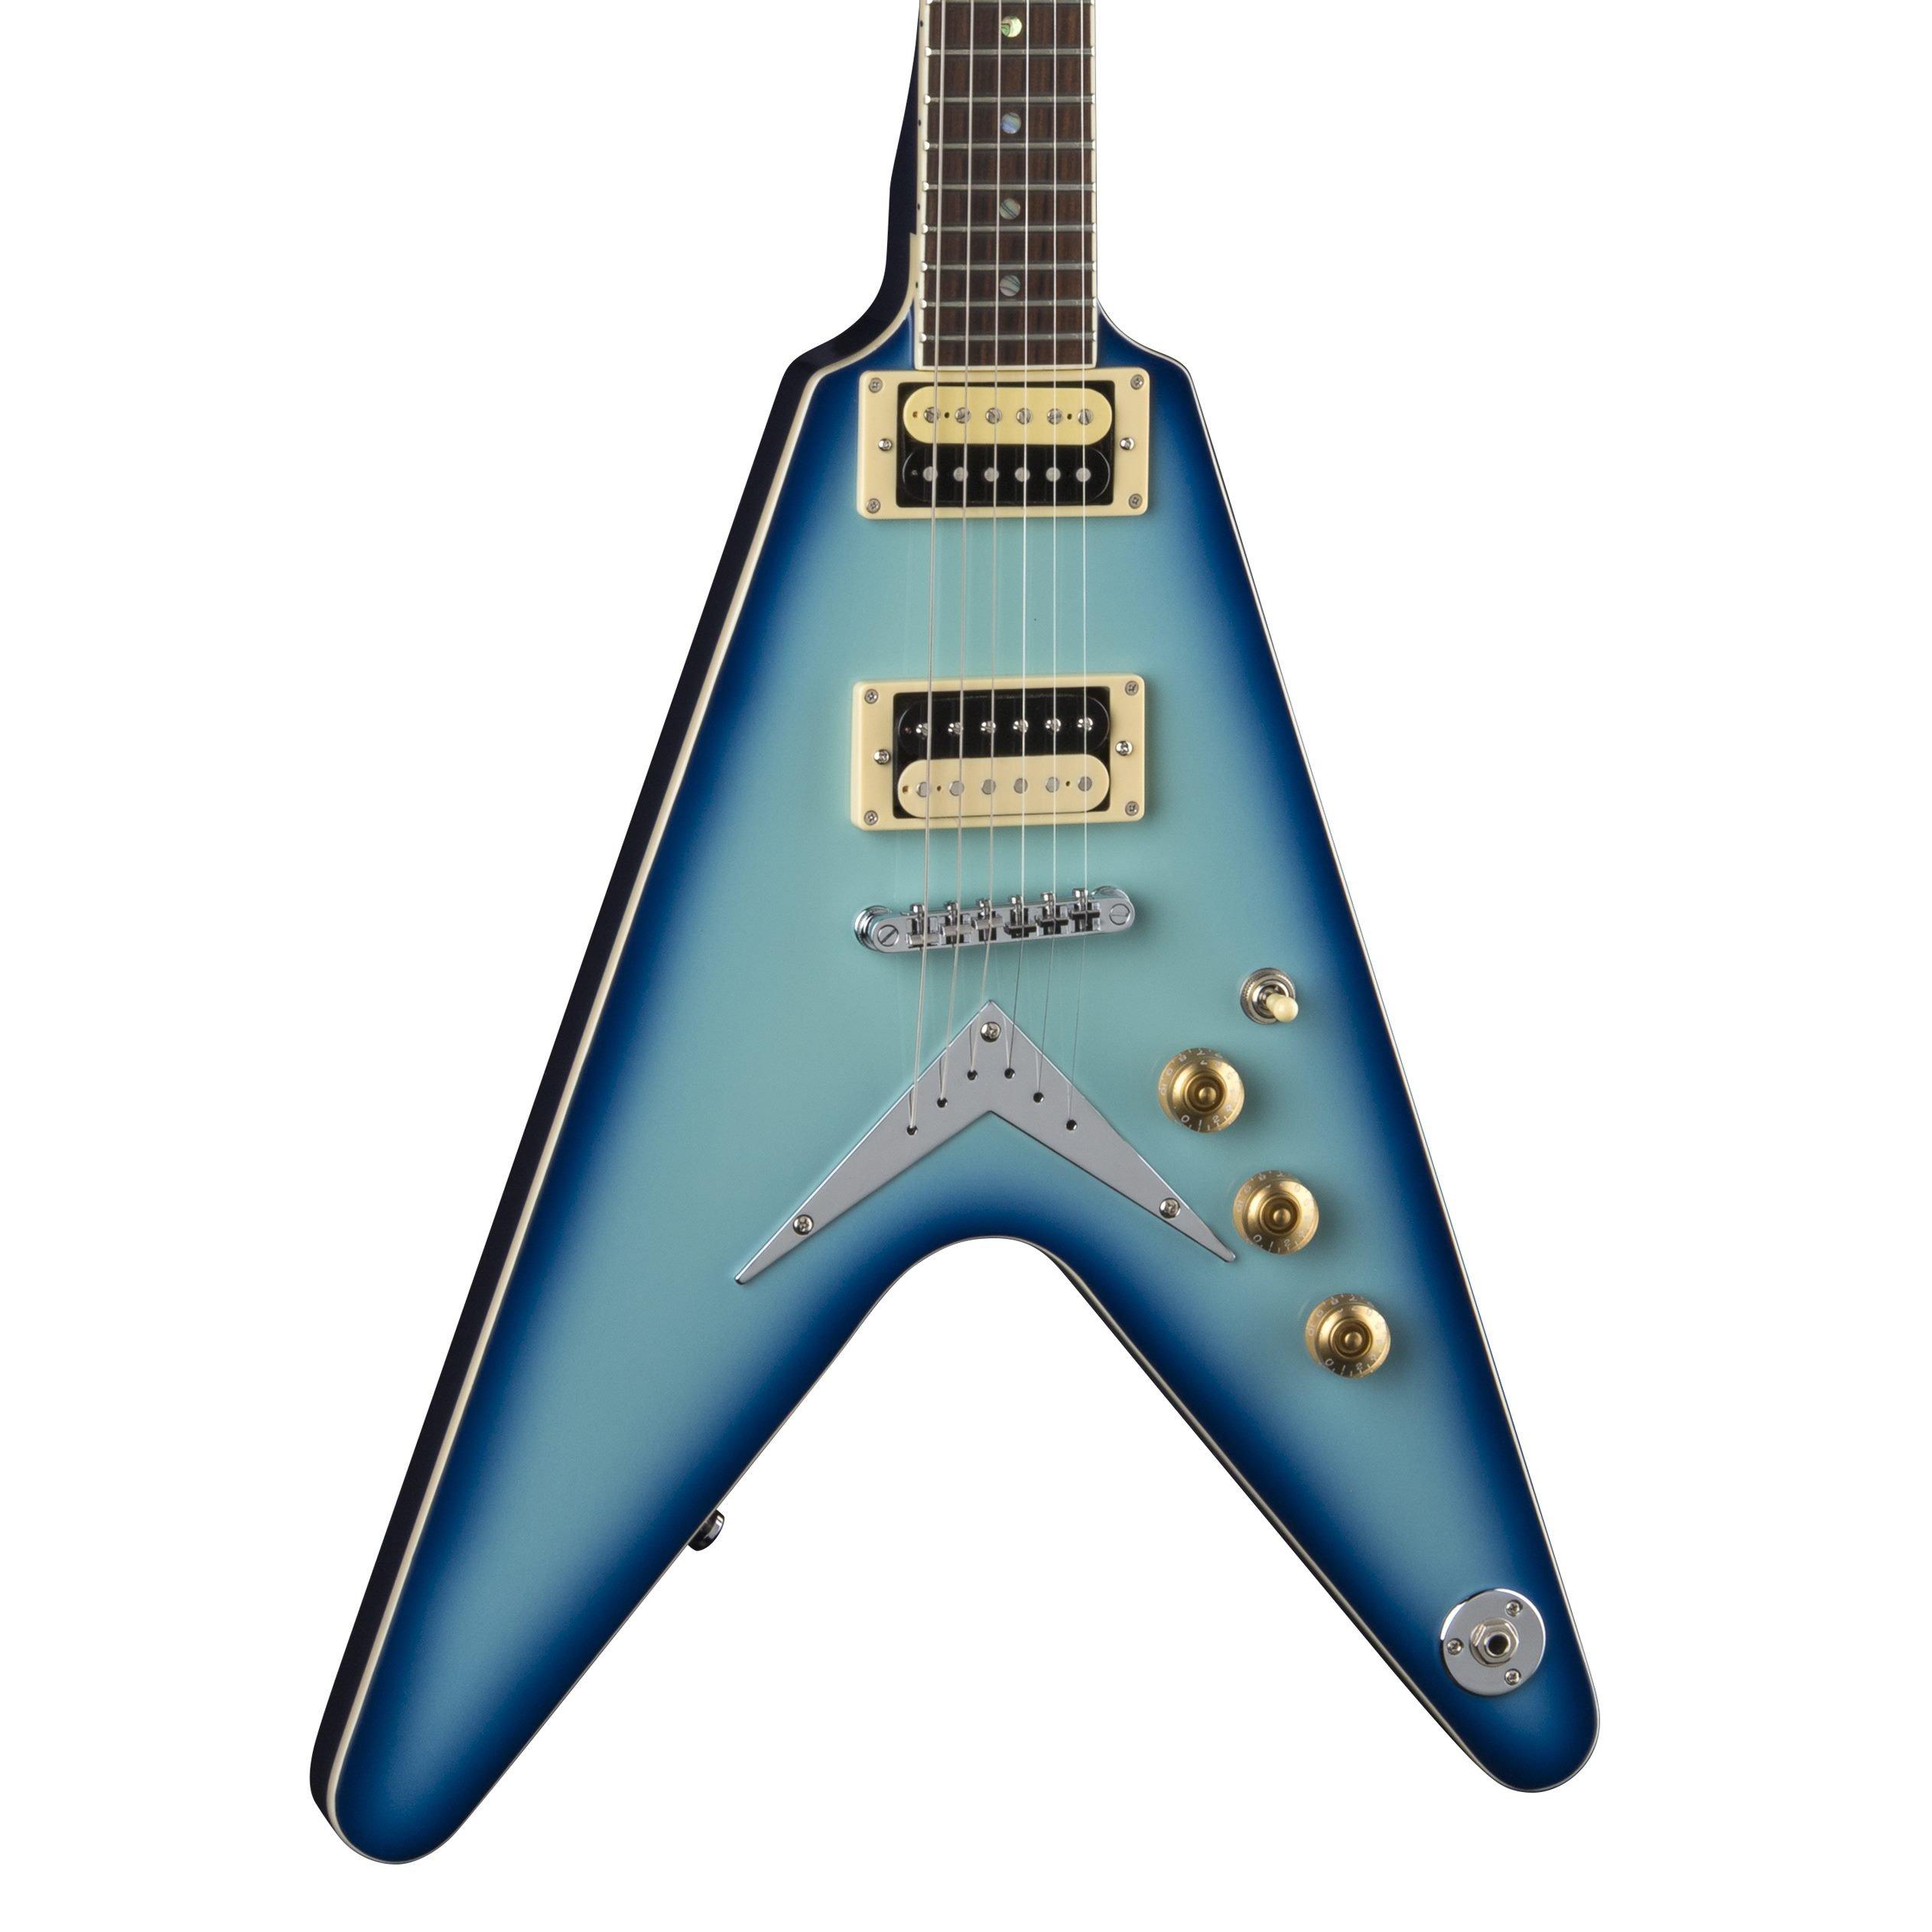 Cheap Dean V 79 Electric Guitar Blue Burst Black Friday & Cyber Monday 2019